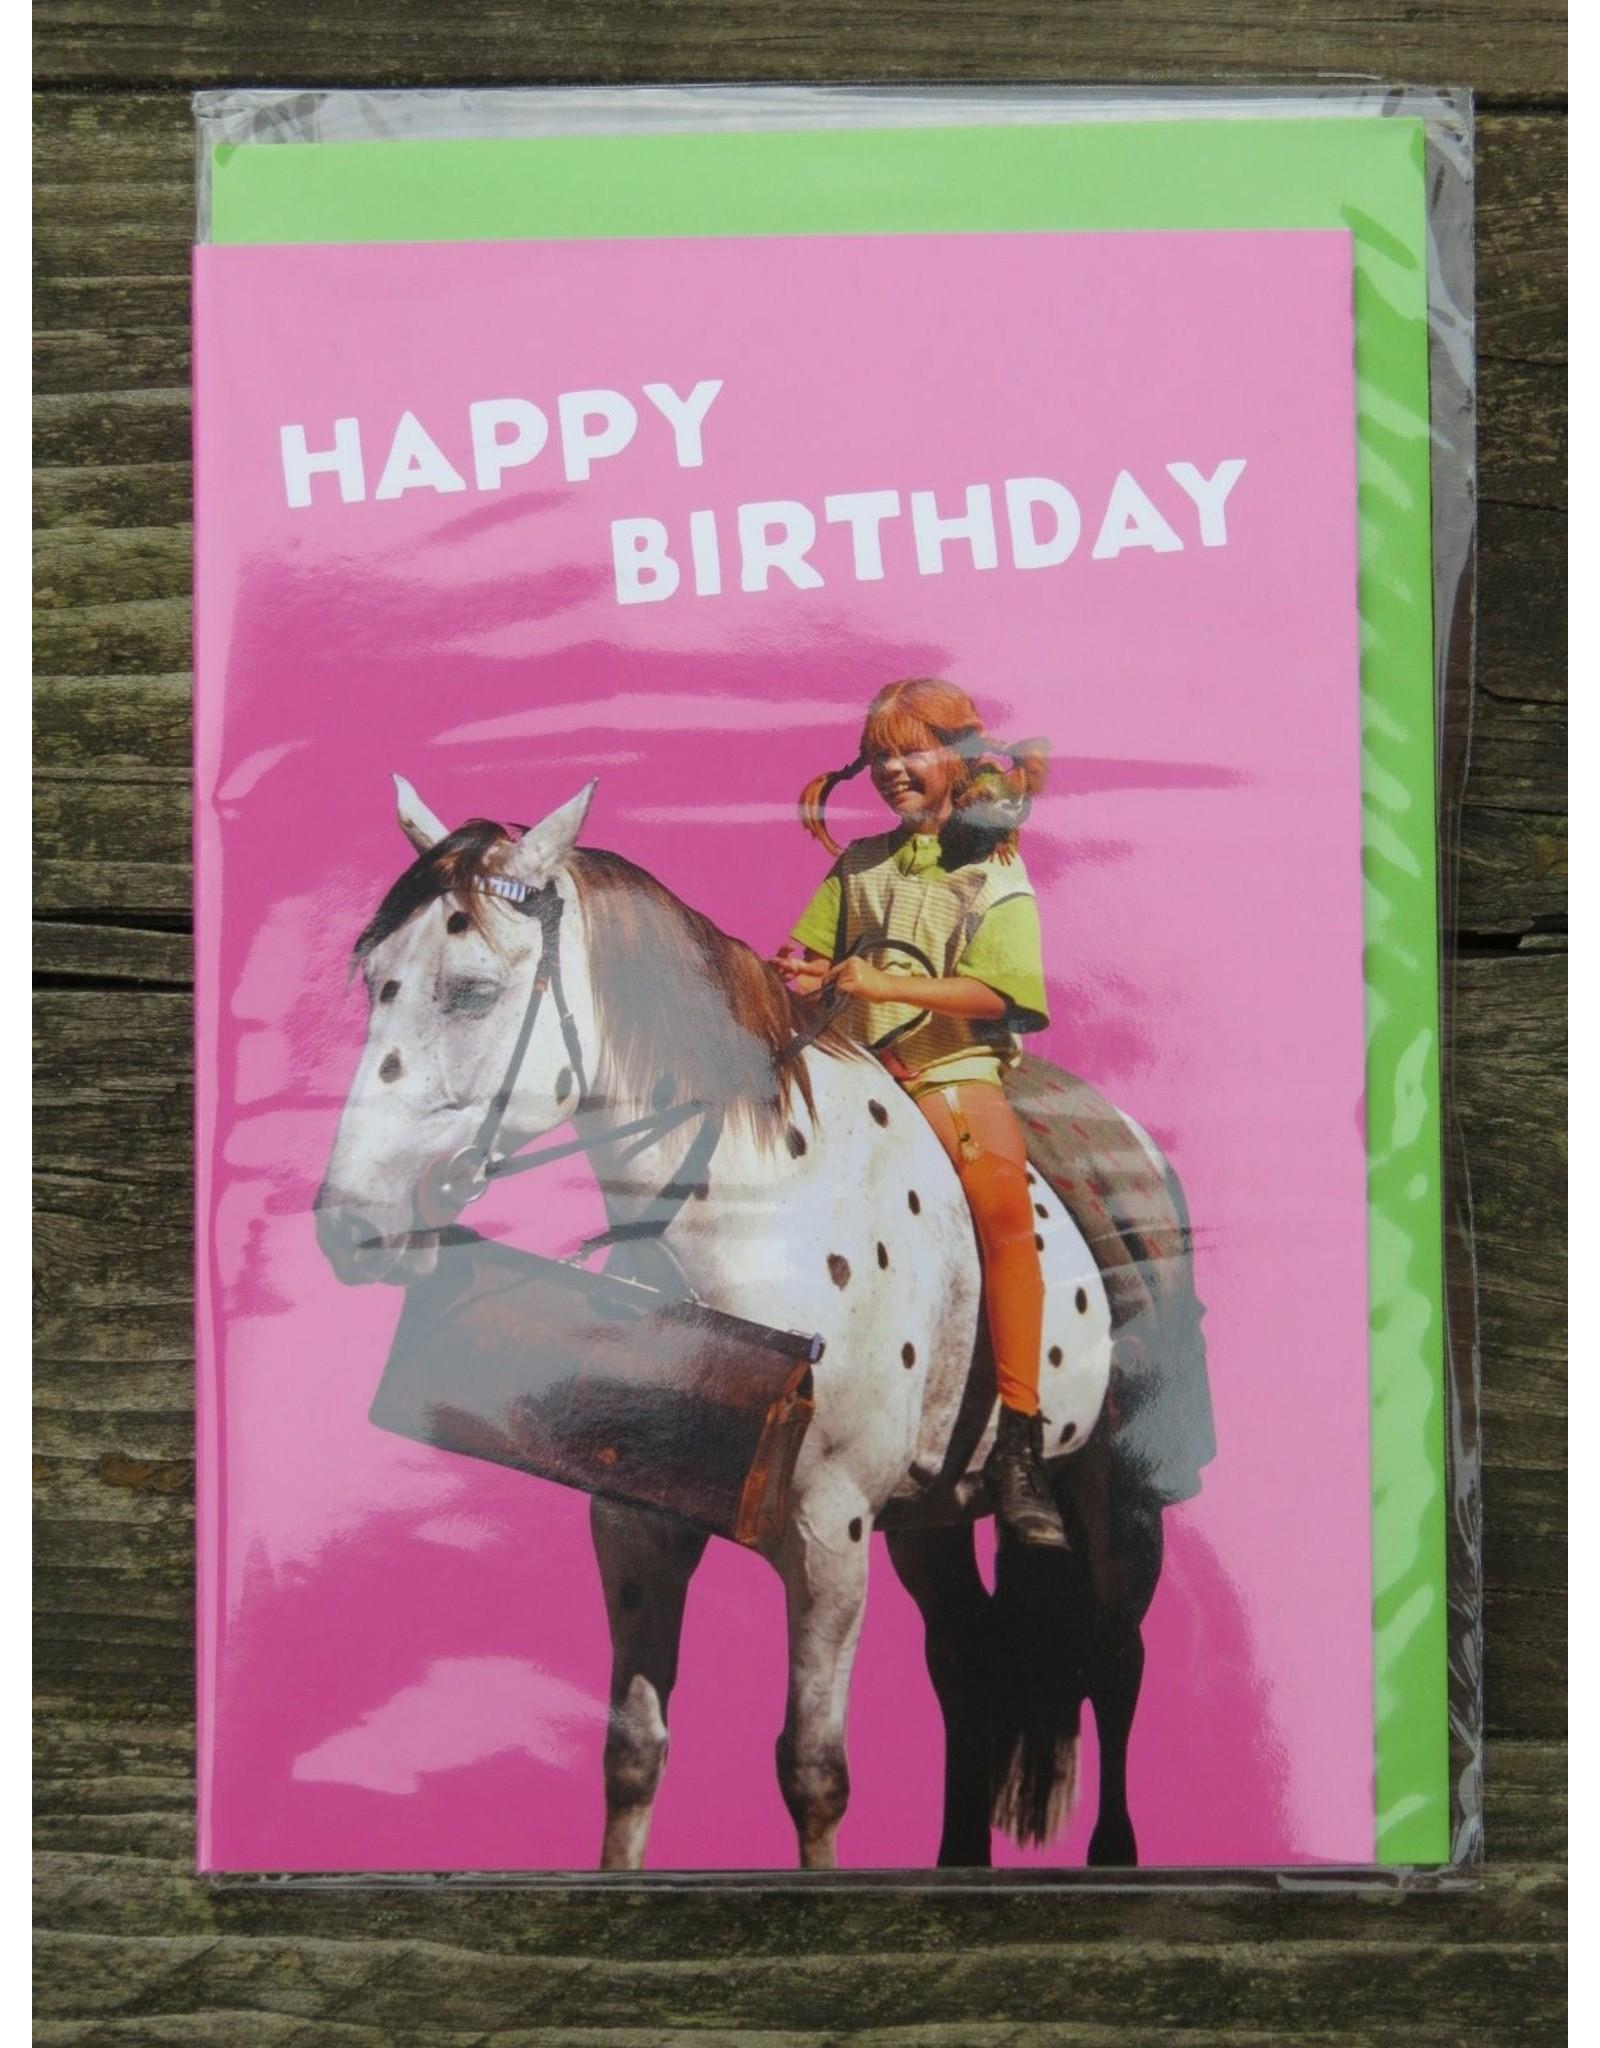 Pippi Langkous Pippi Langkous verjaardagskaart met envelop - witje